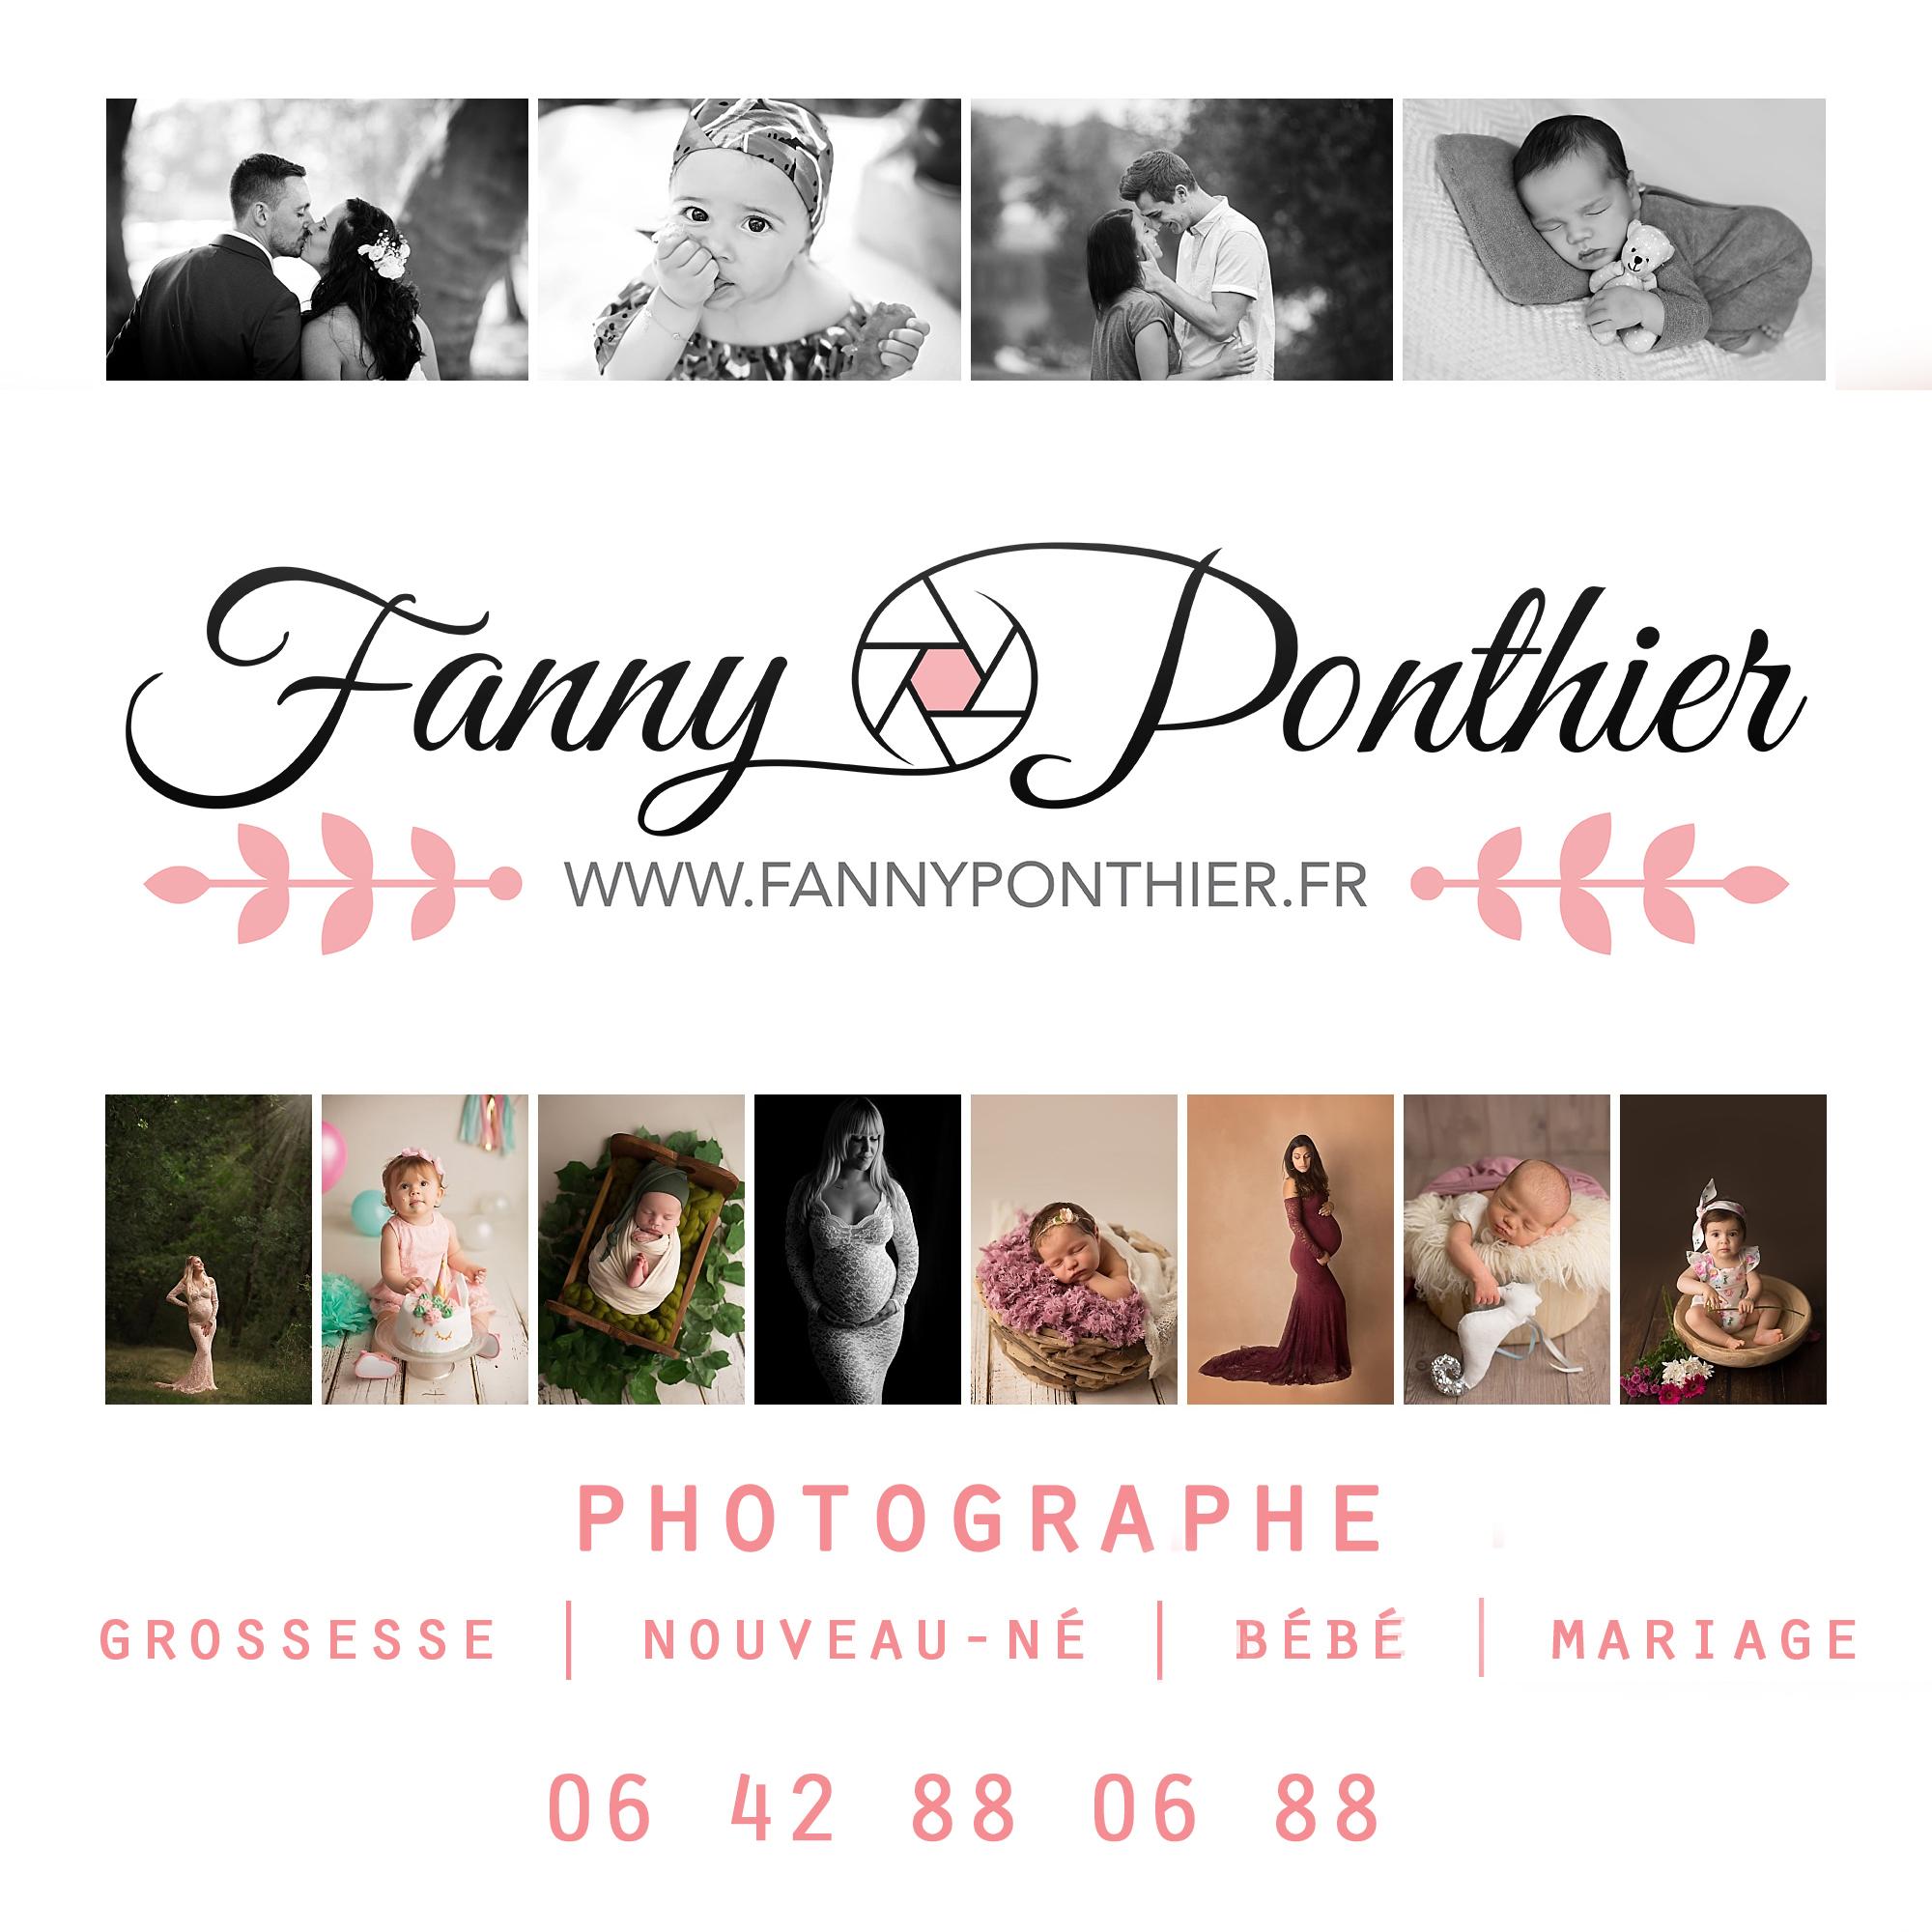 Fanny Ponthier